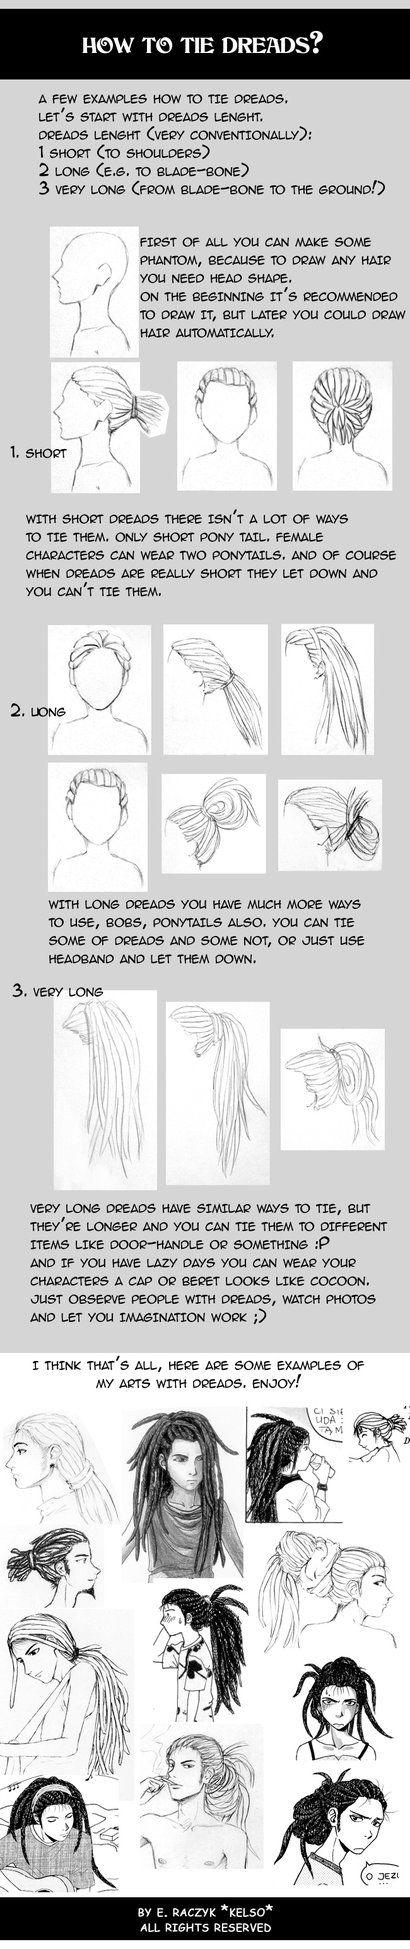 Dreads tie tutorial